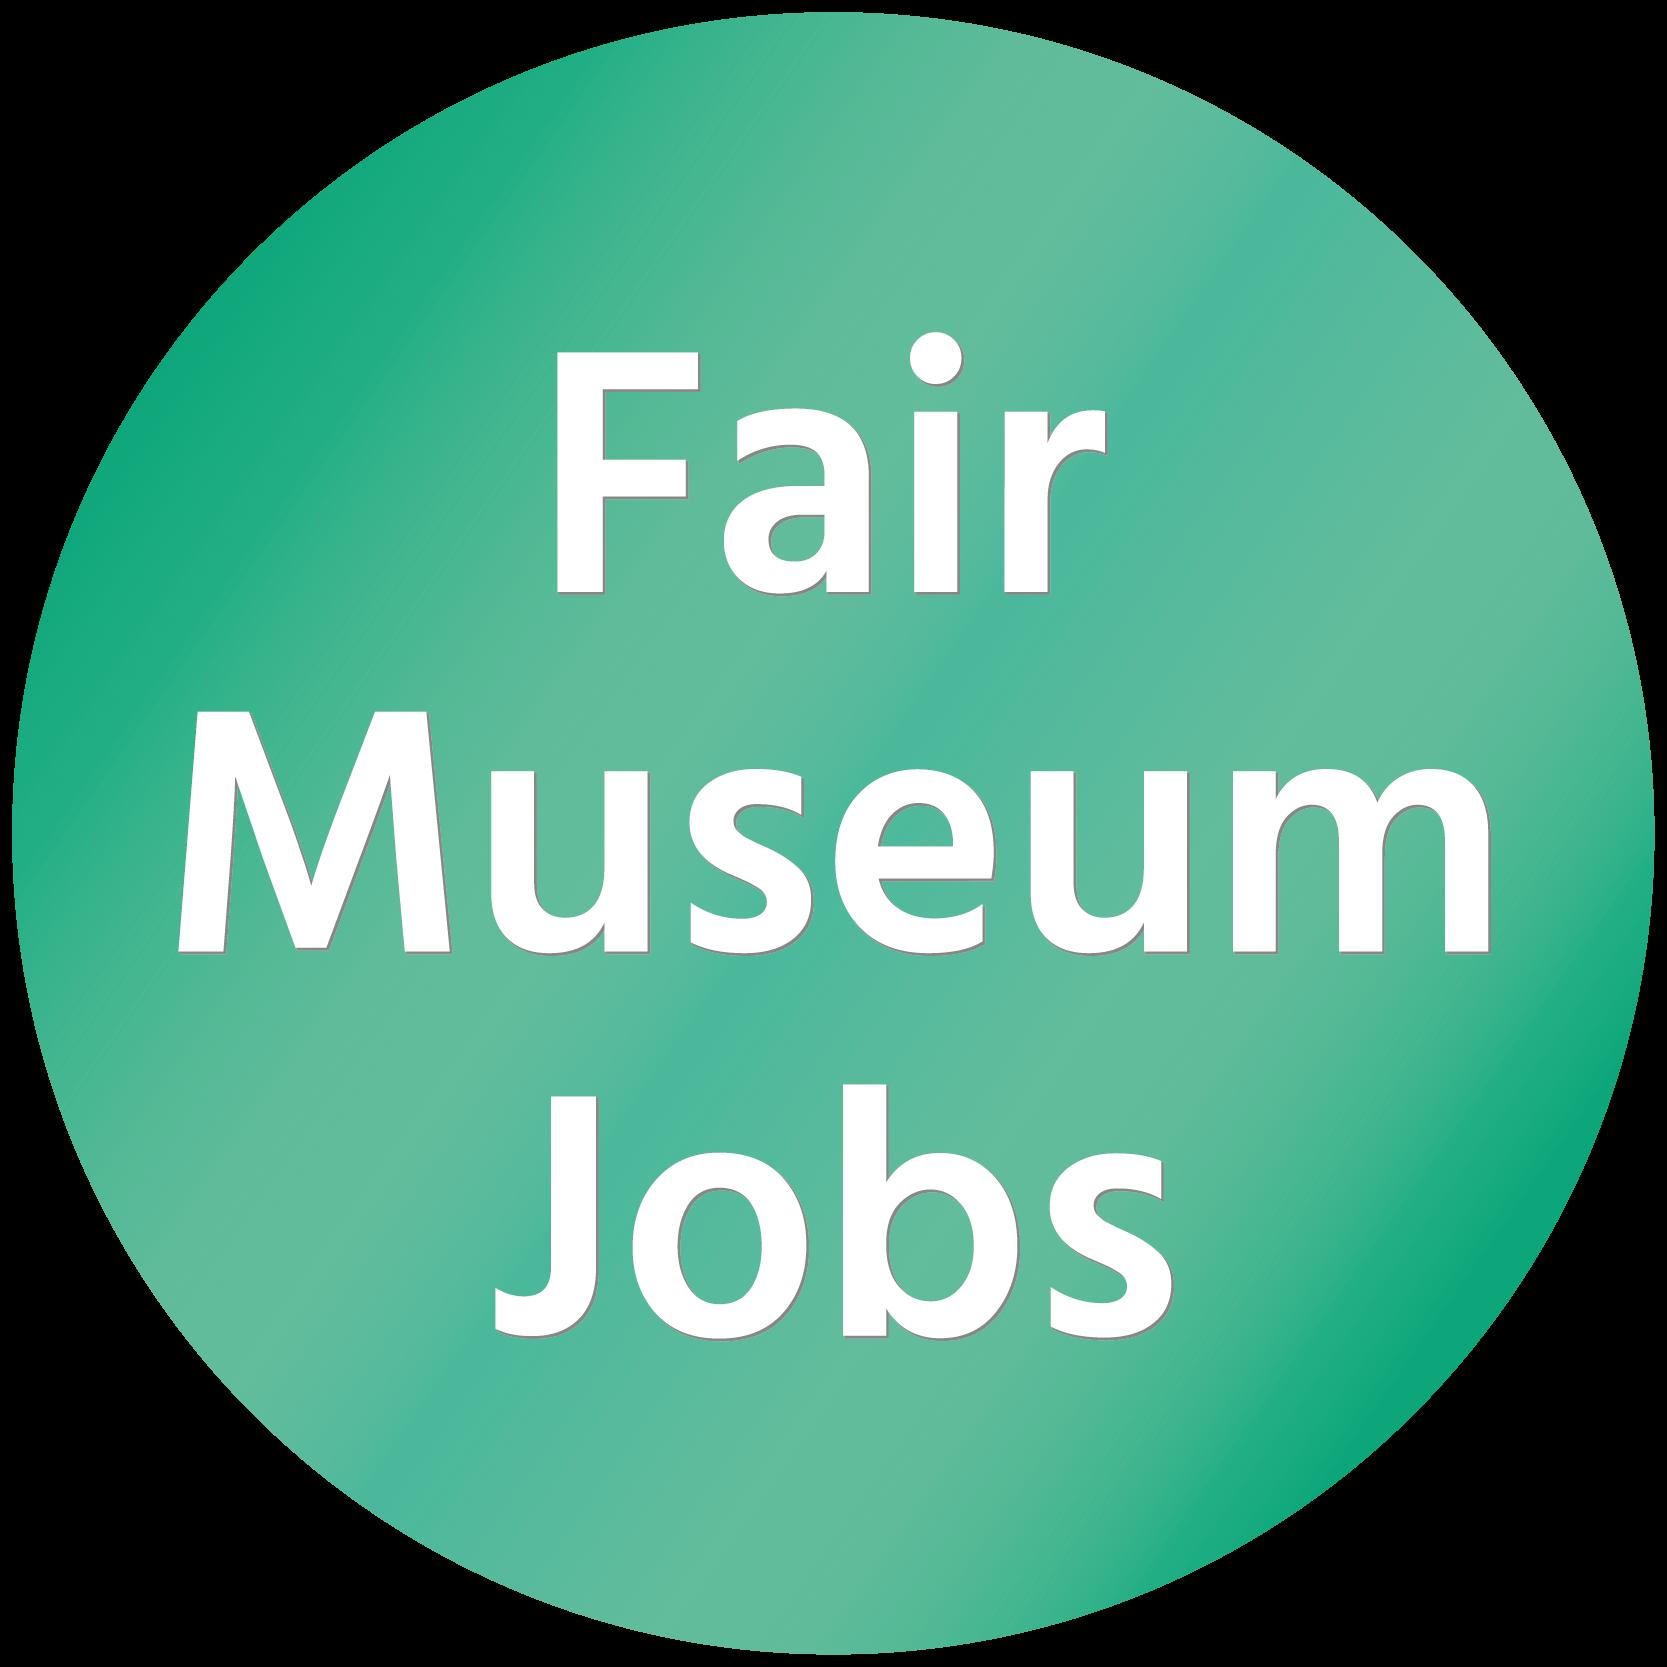 Fair Museum Jobs